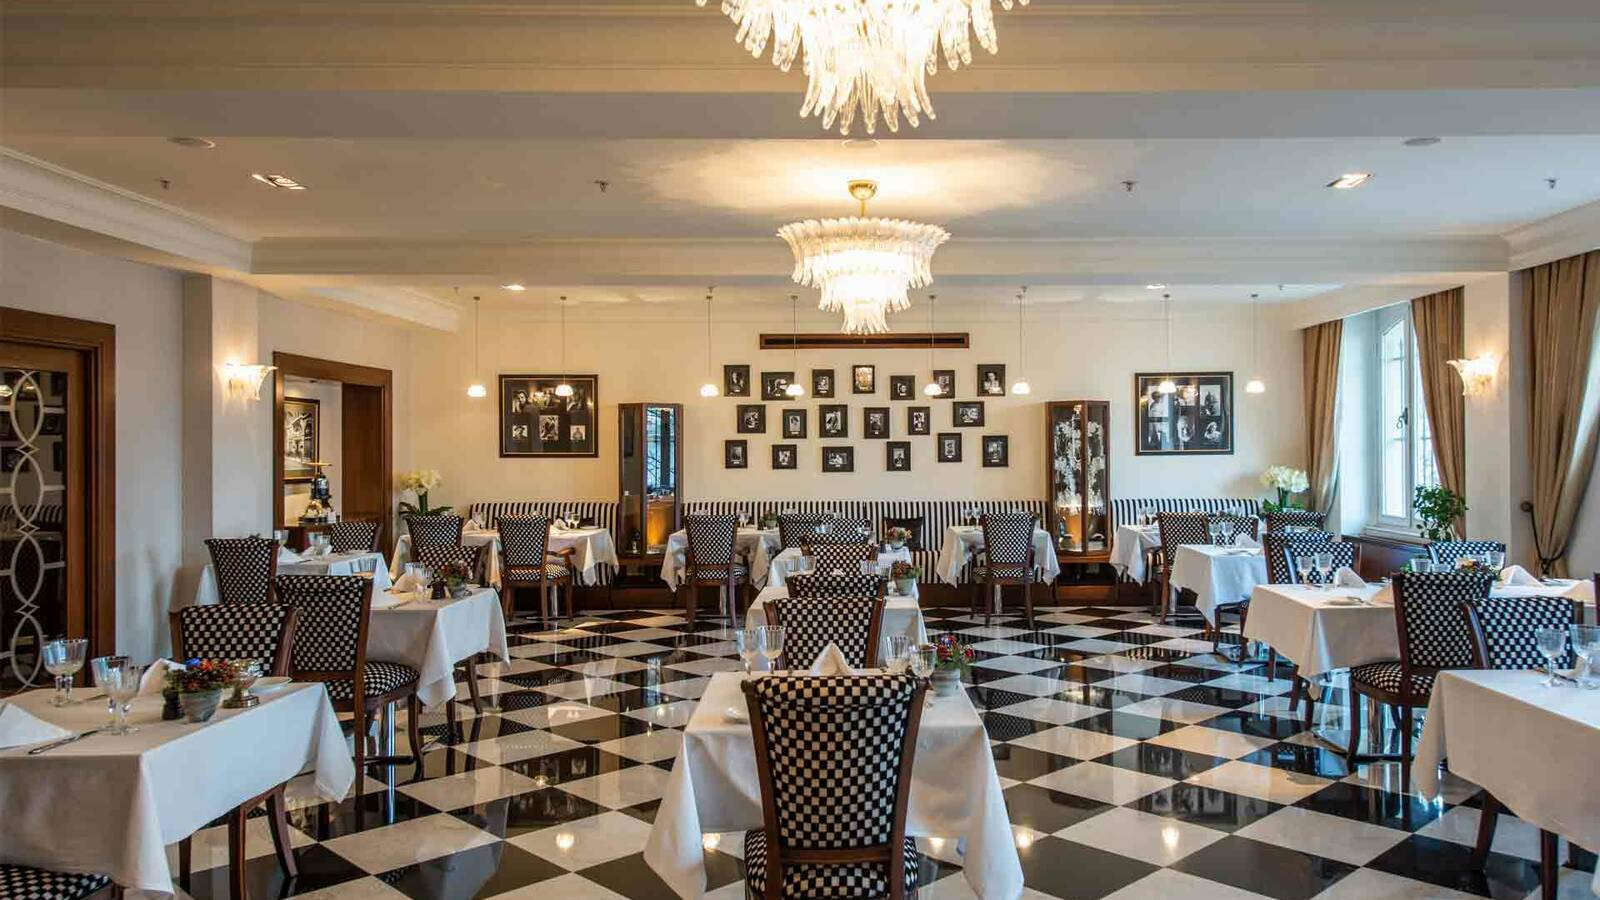 Turquie Pera Palace Restaurant Agatha